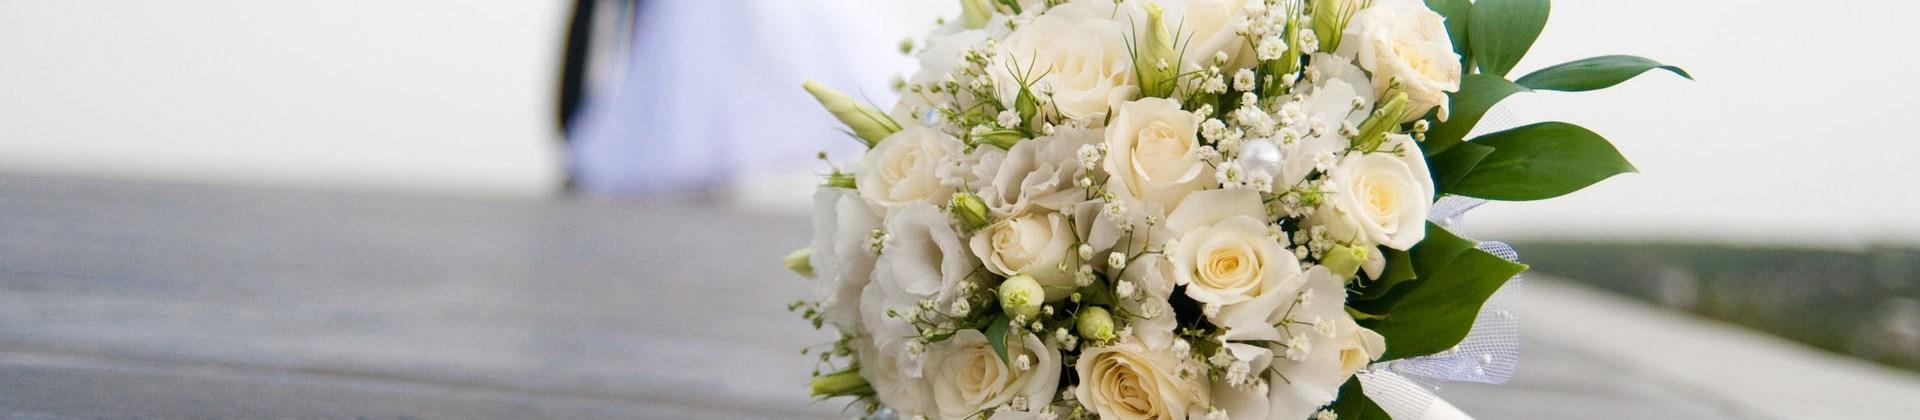 wedding flowers history